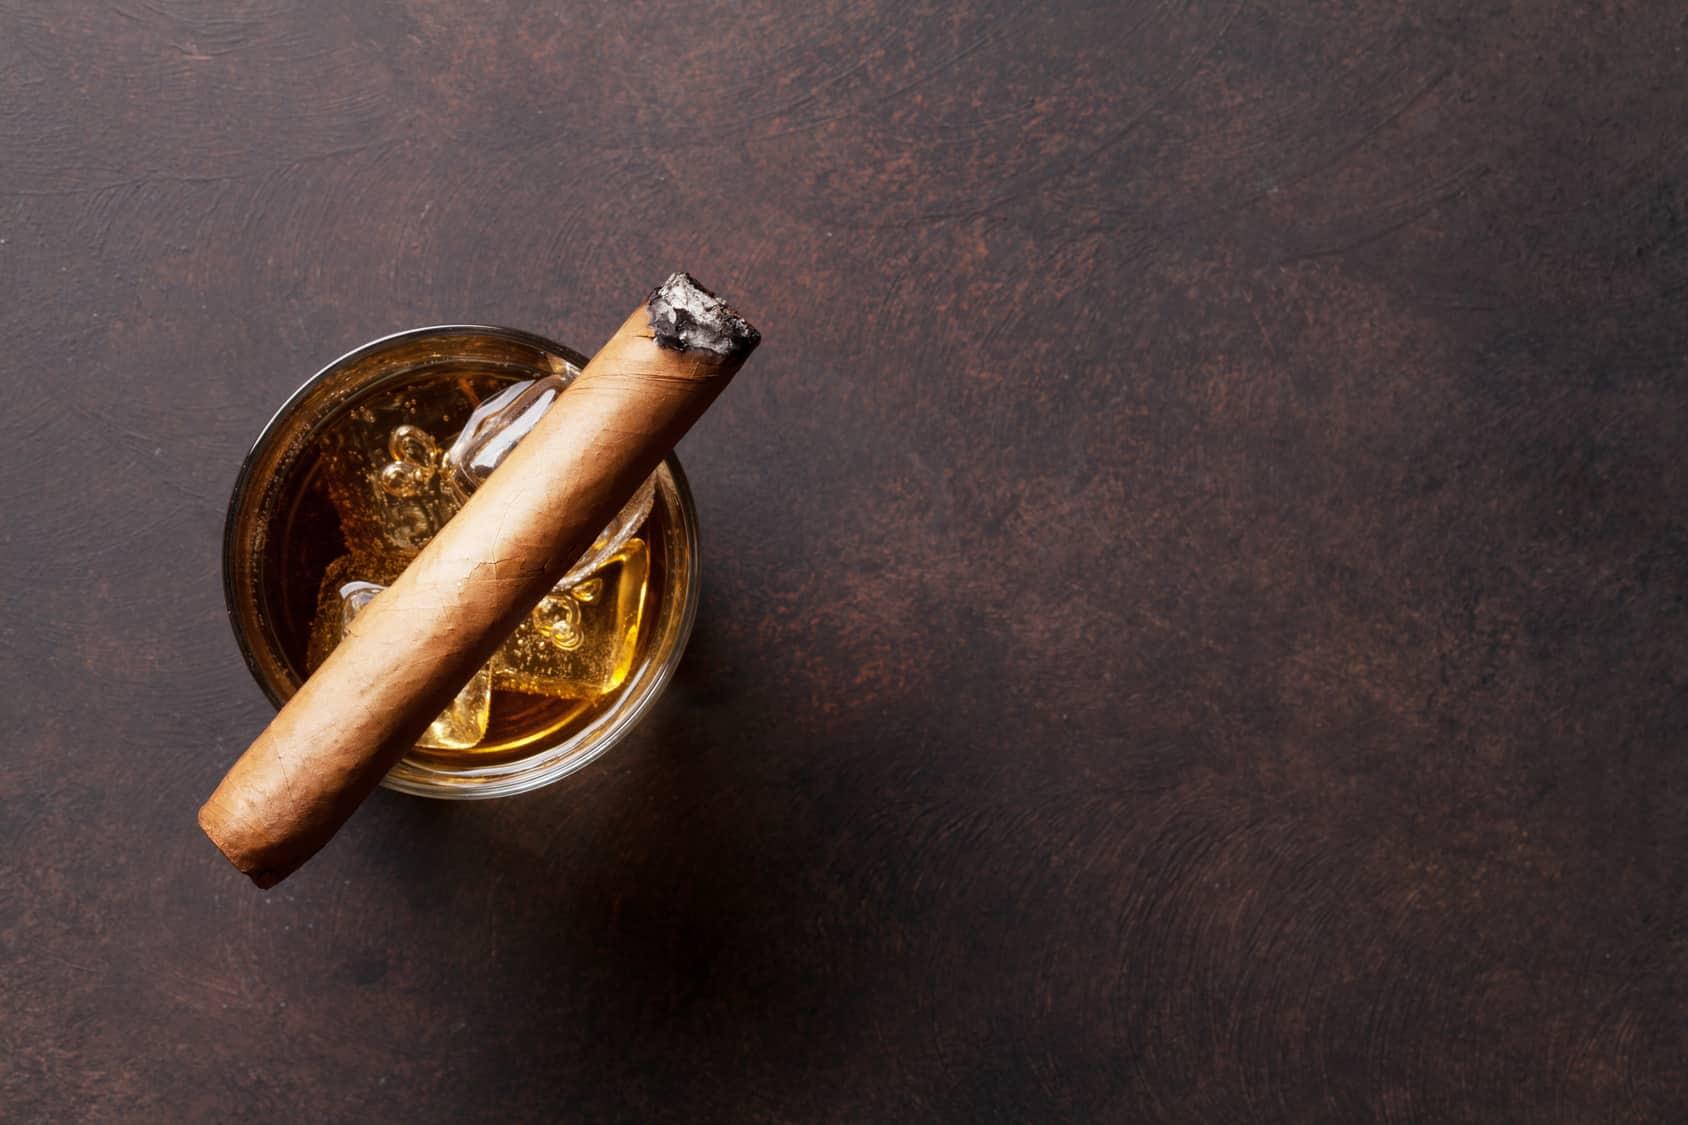 cigar on a glass